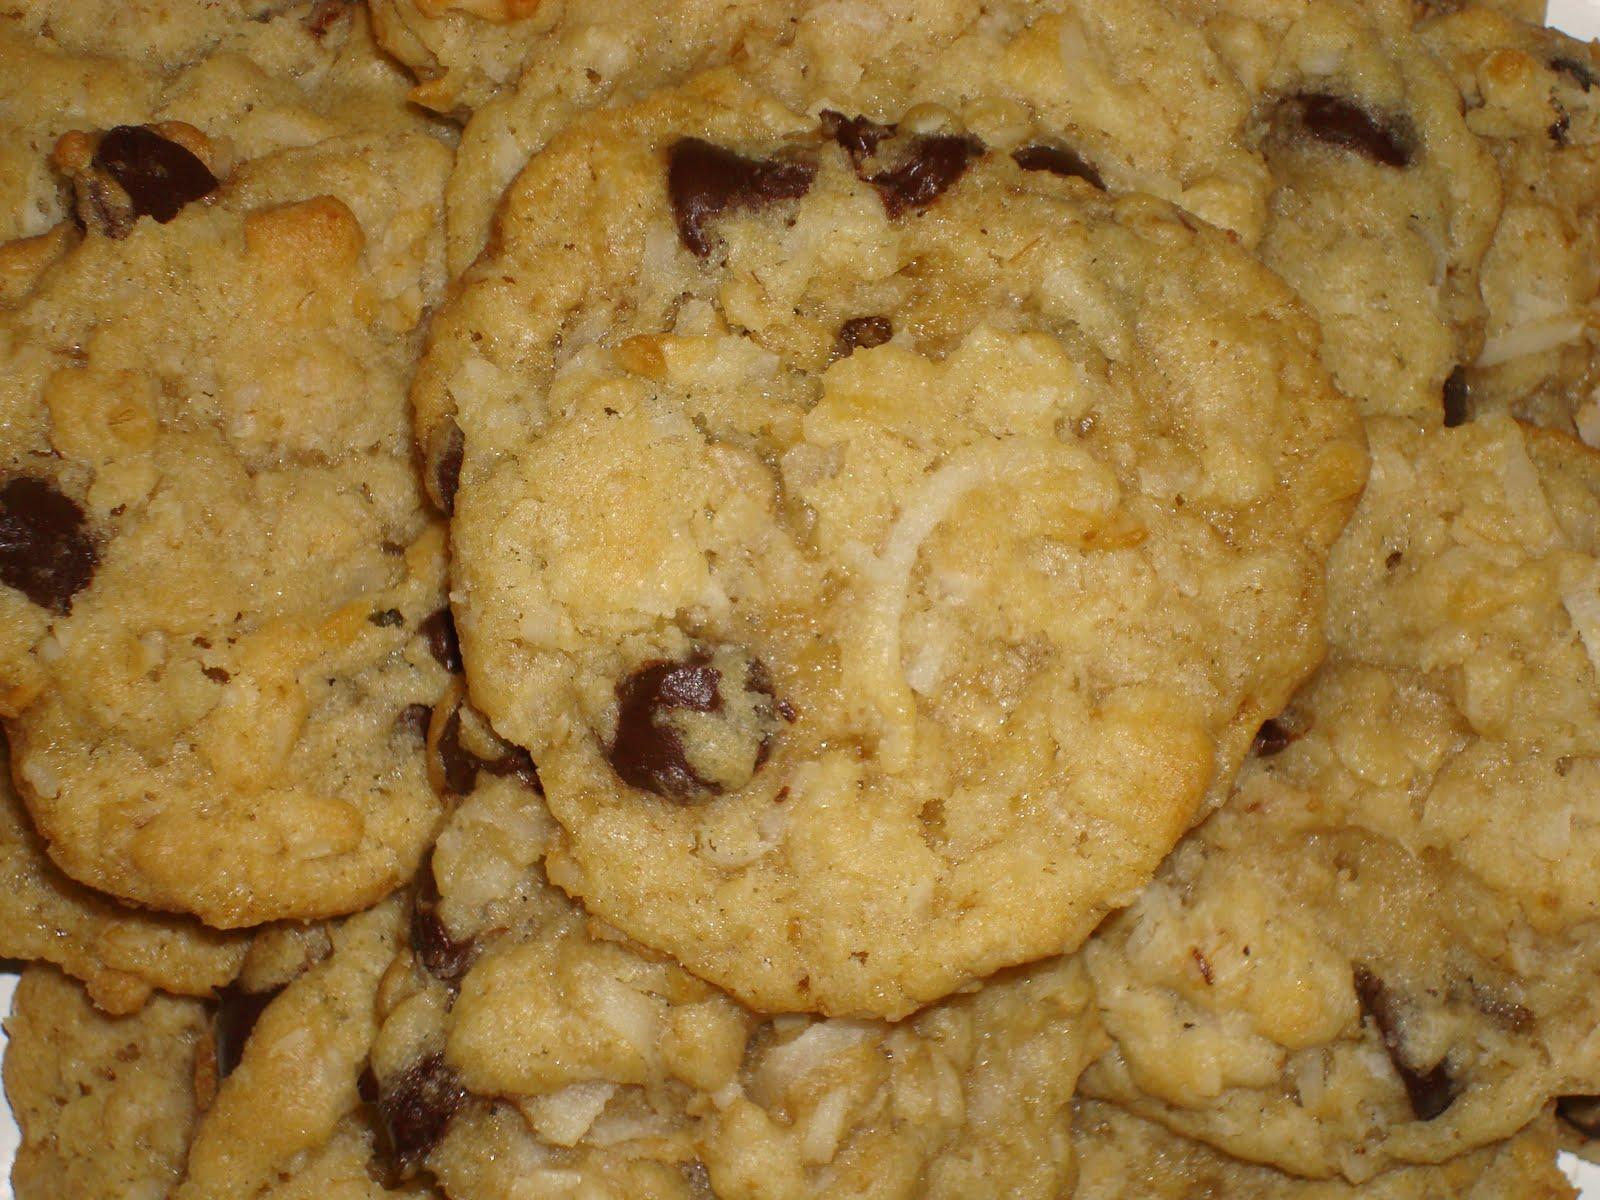 Rachel's Sugar Rush: Oatmeal Coconut Chocolate Chip Cookies